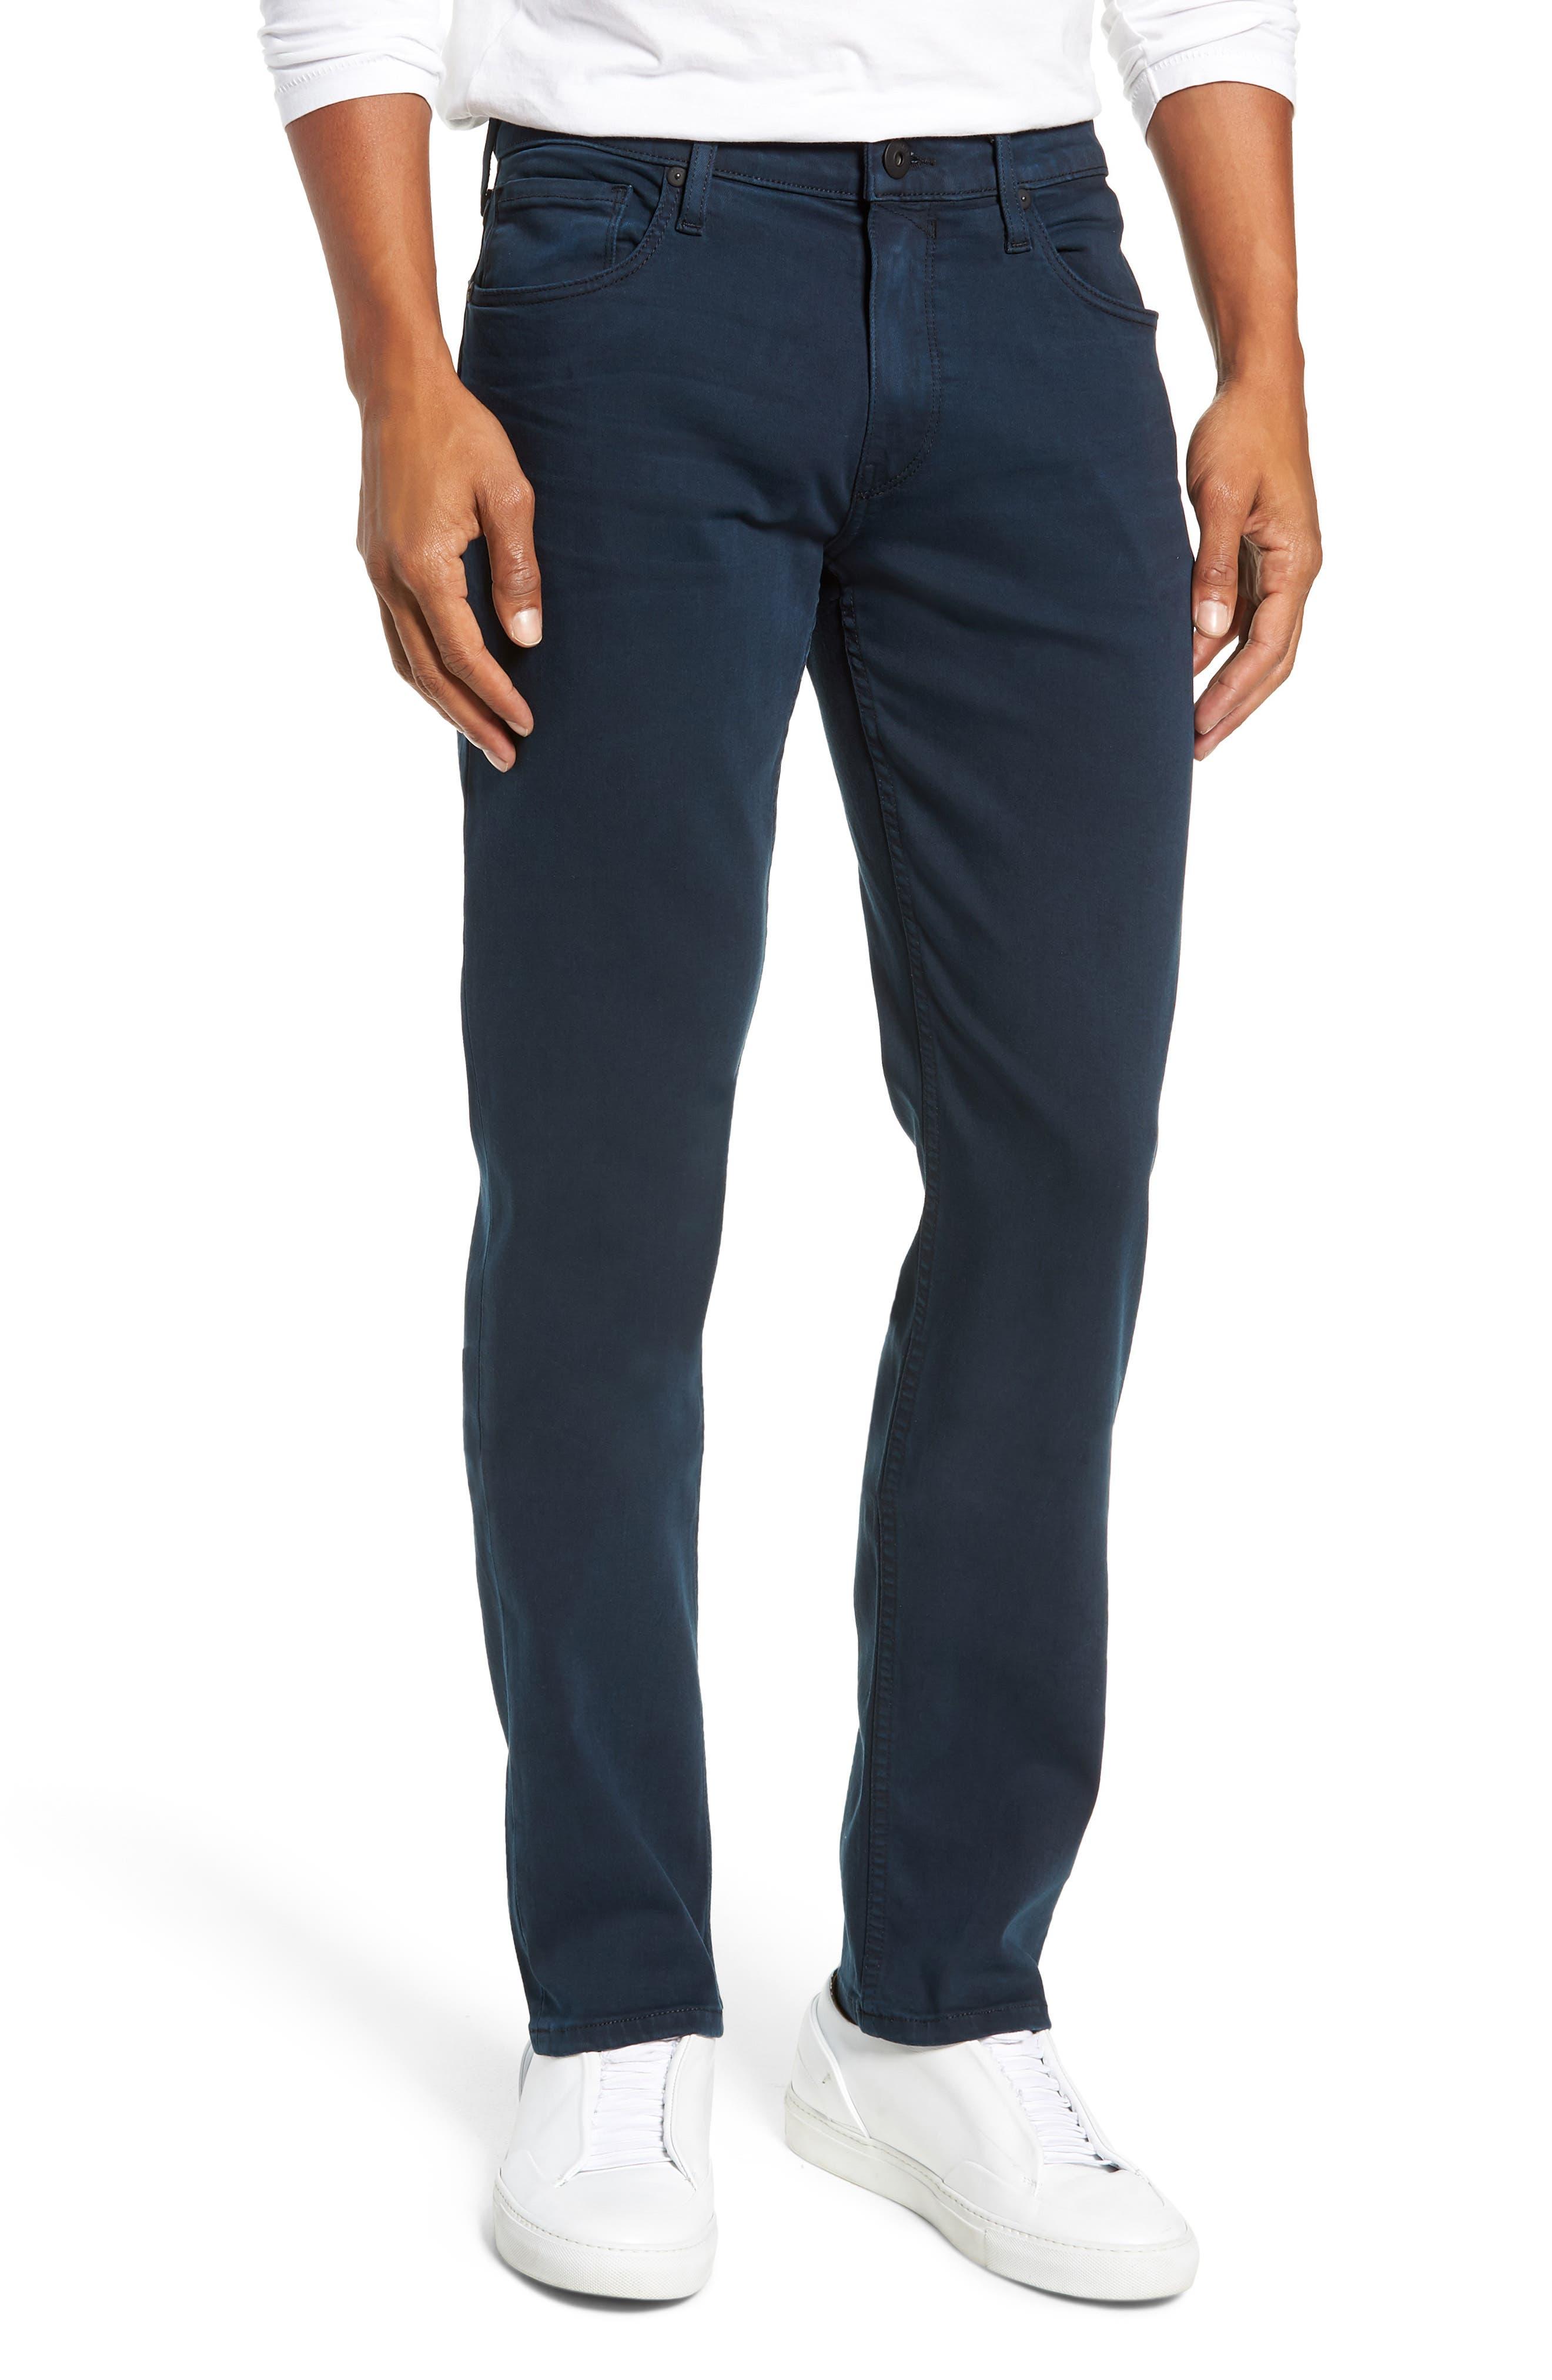 Transcend - Federal Slim Straight Leg Jeans,                             Main thumbnail 1, color,                             VINTAGE SKYFALL